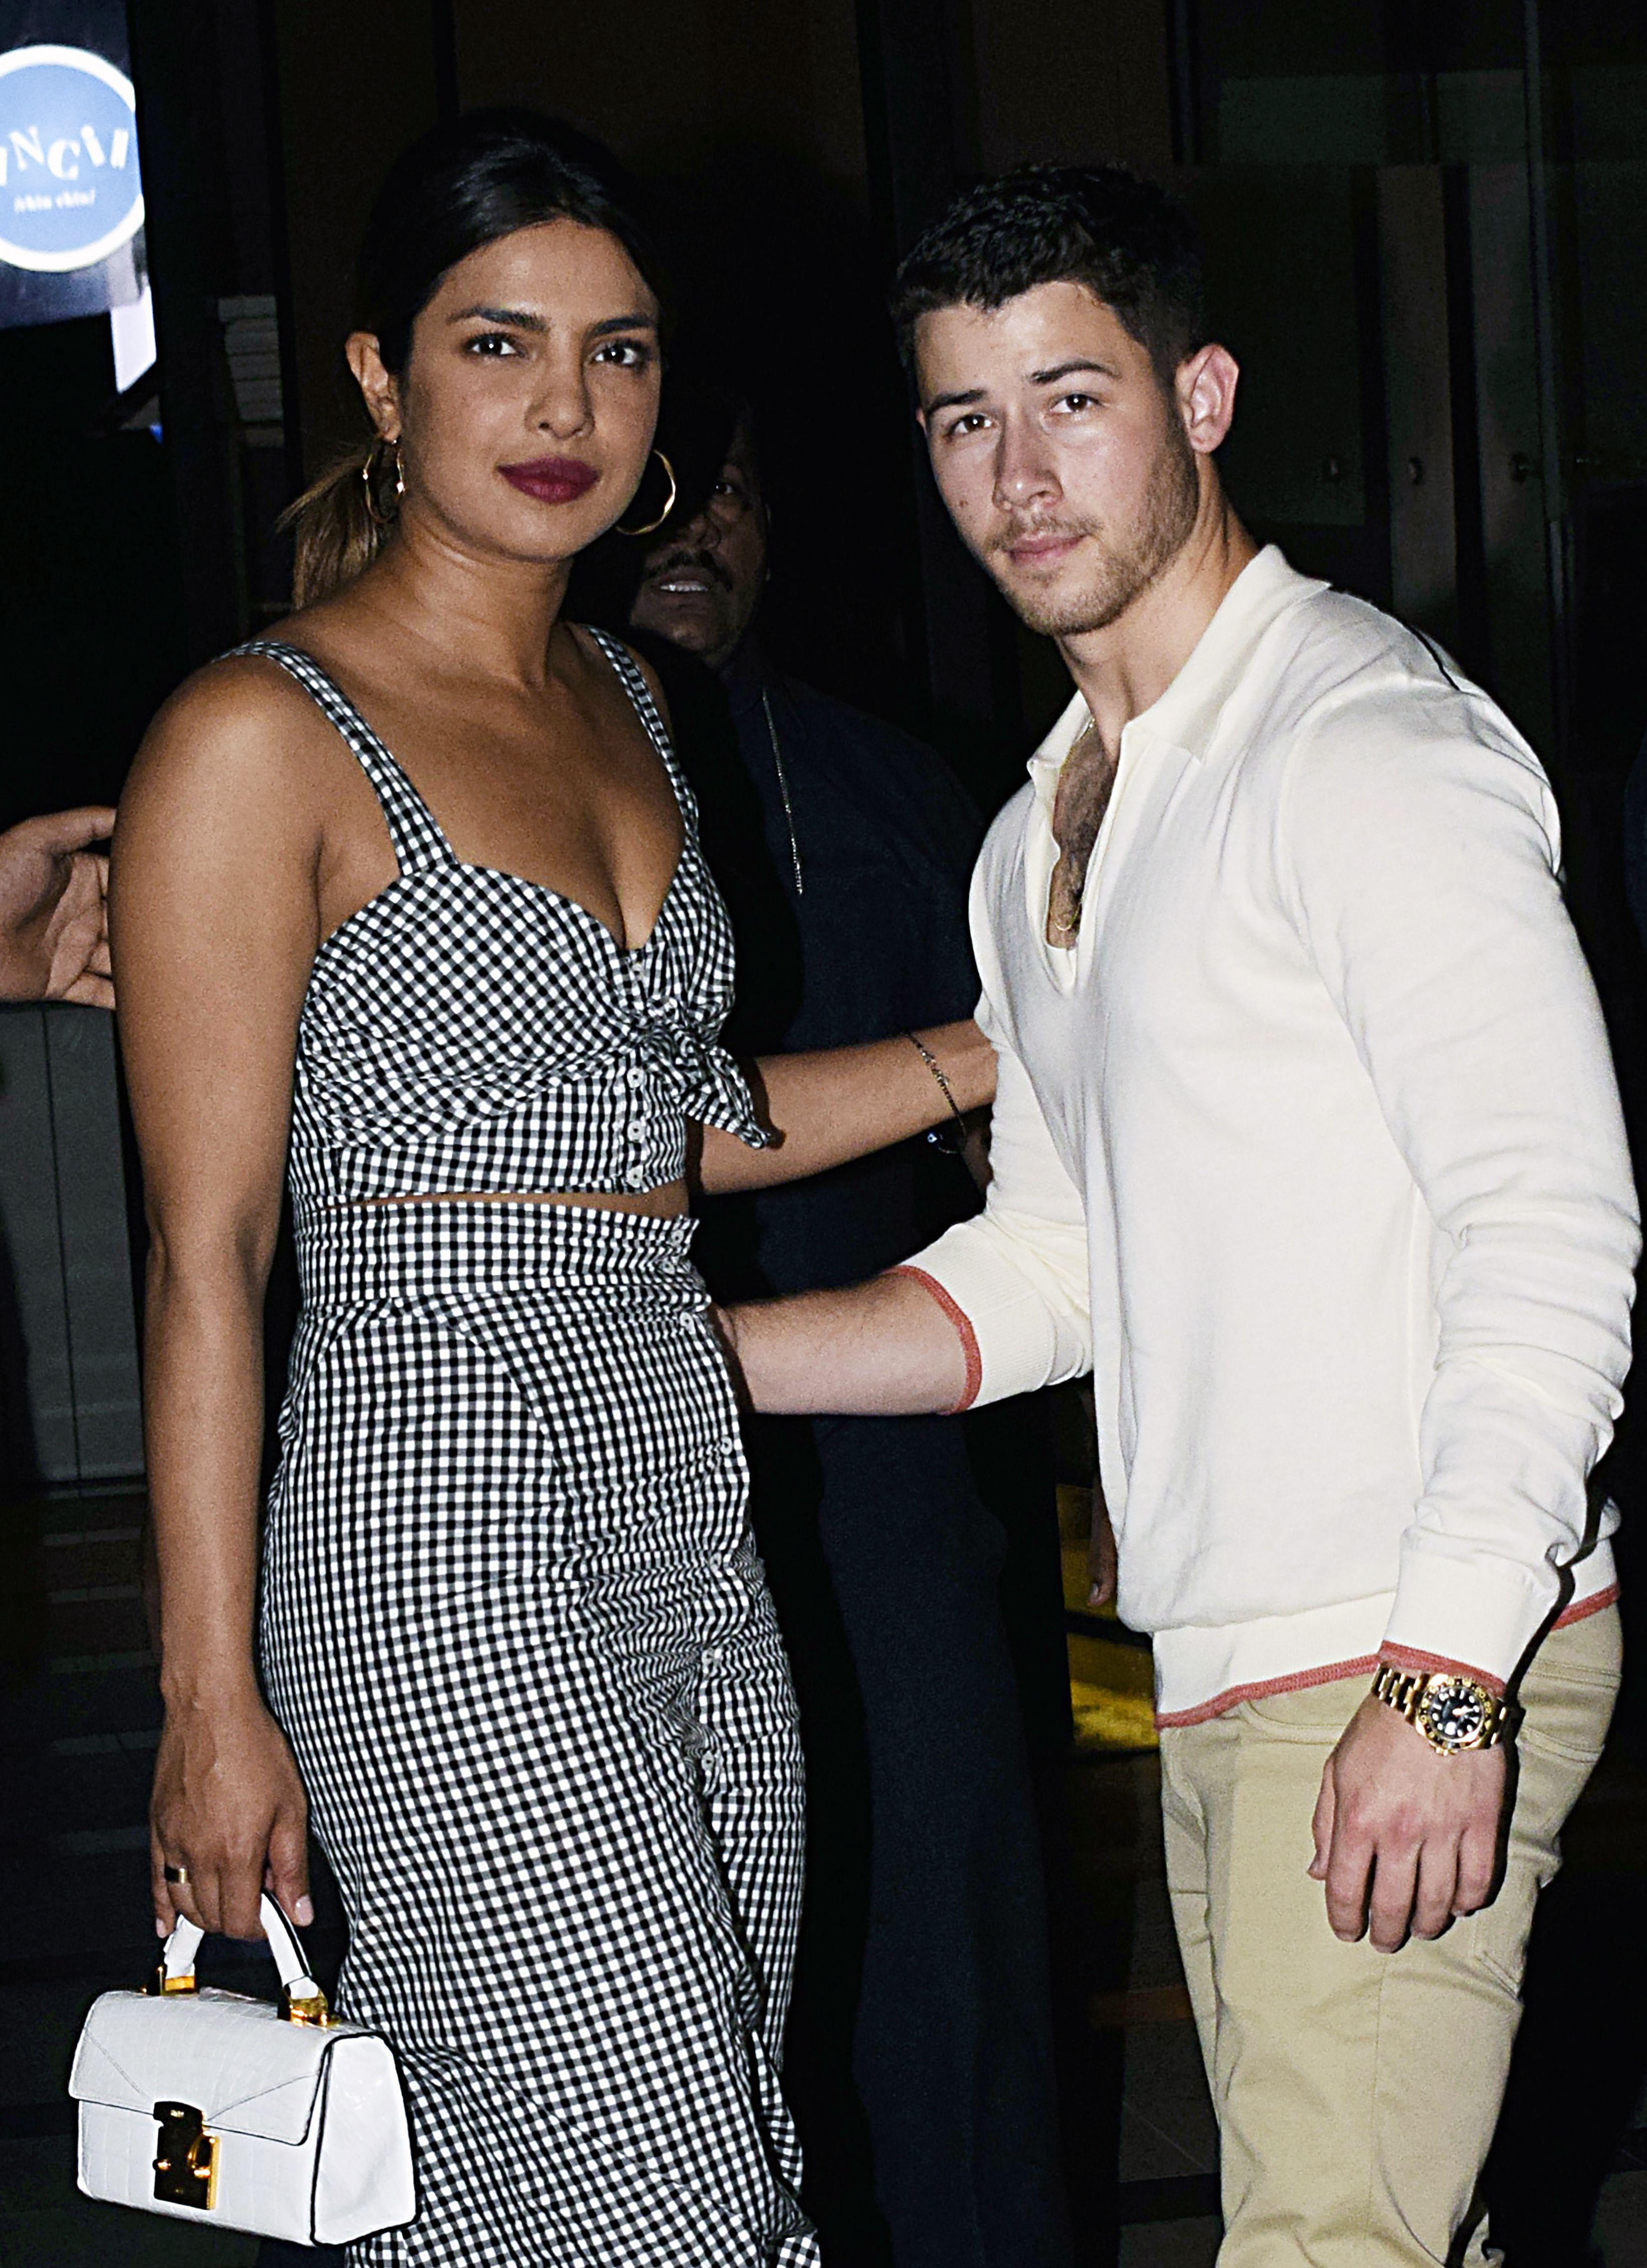 Nick Jonas And Priyanka Chopra Could Be Getting Married VERY Soon!